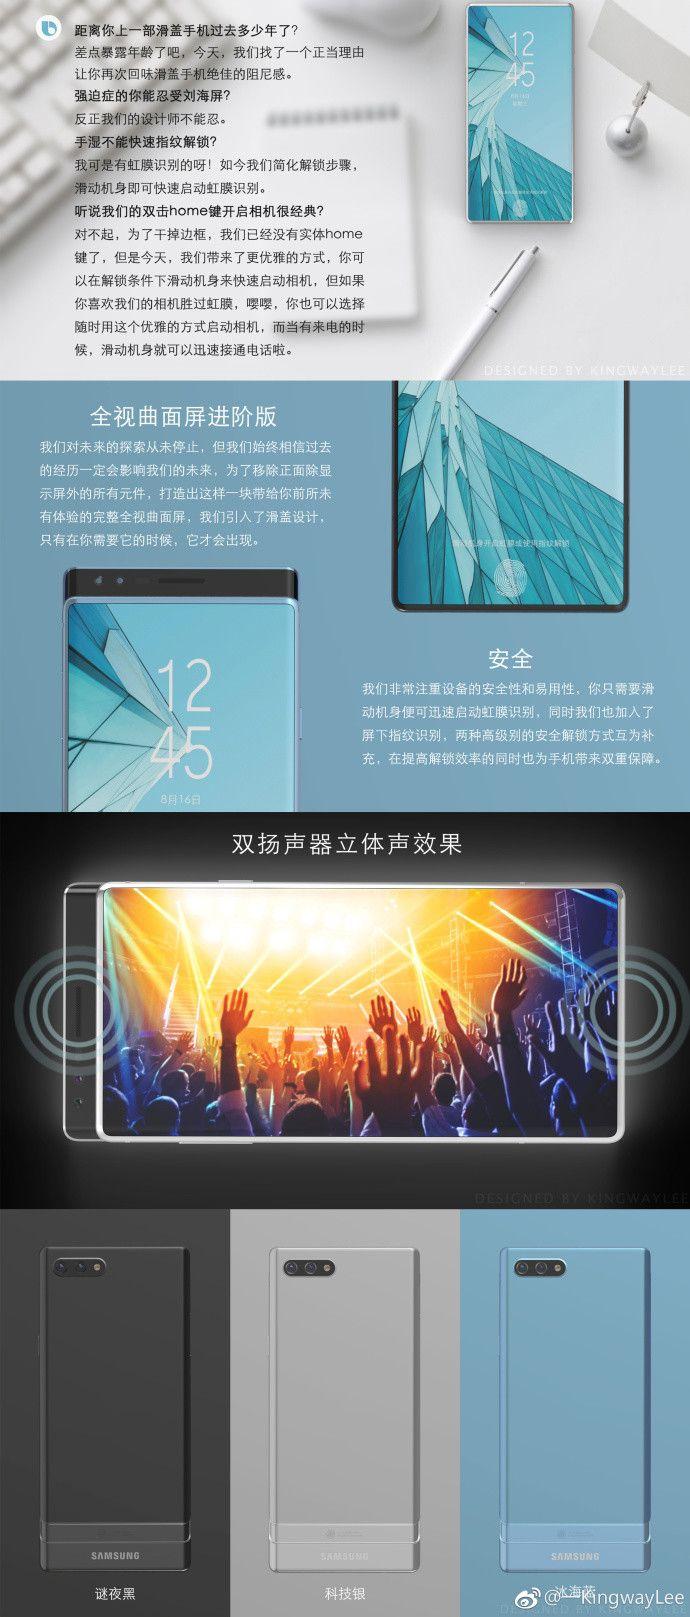 Слайдер Samsung Galaxy S9 — смелый эксперимент концептодела – фото 1